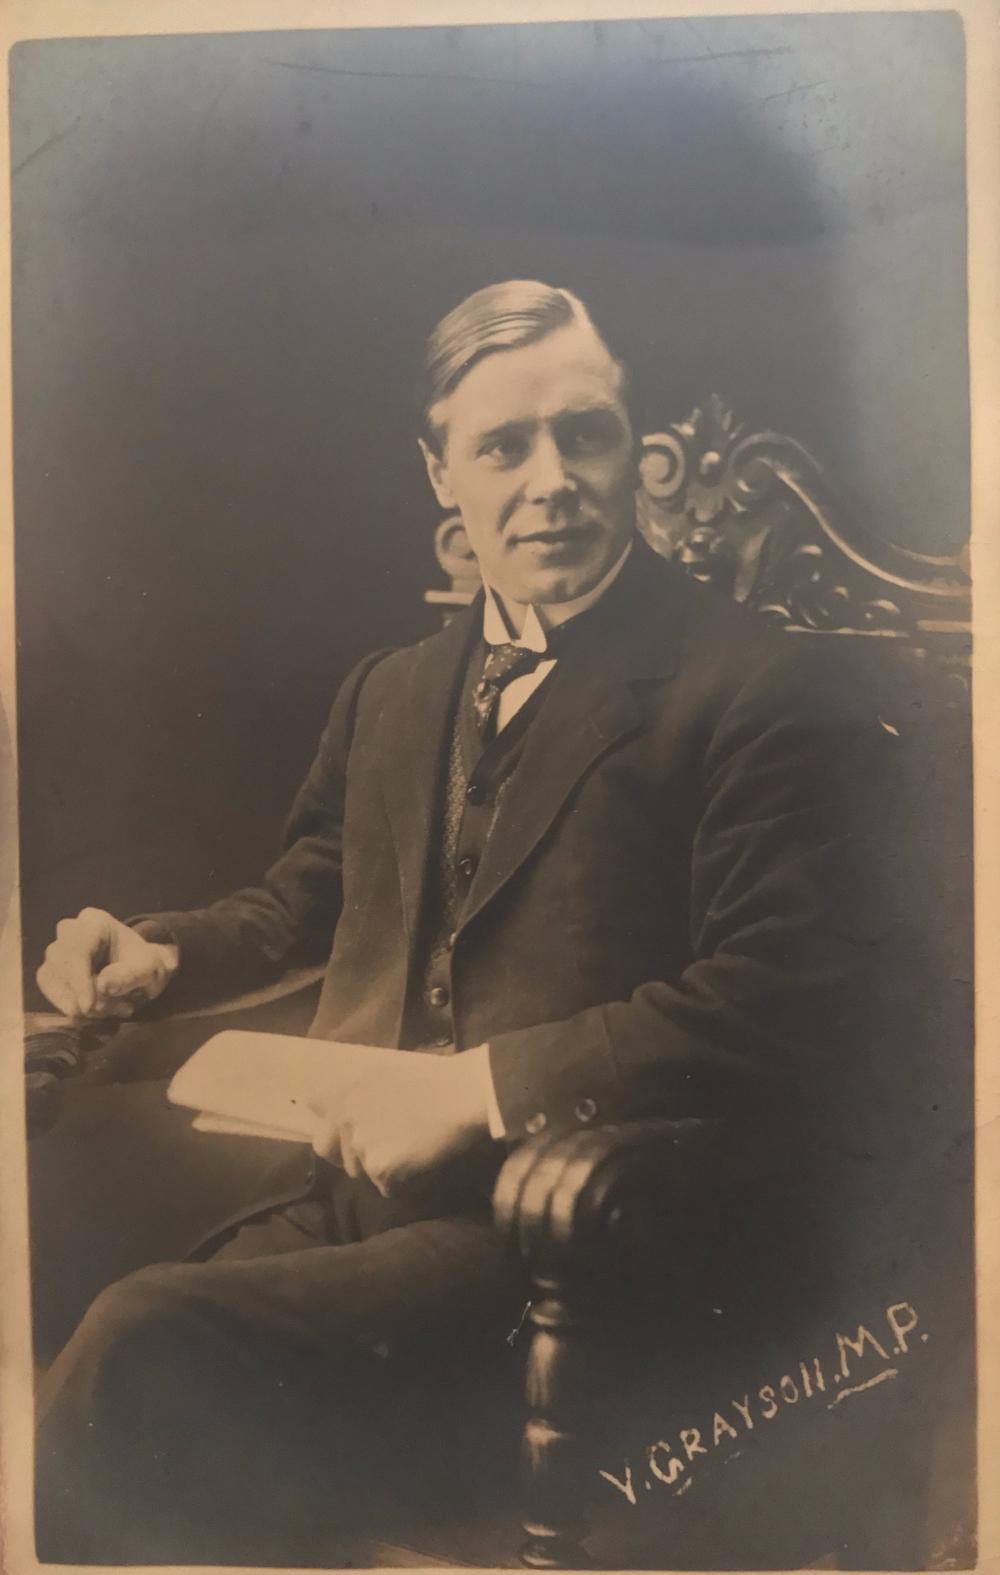 Postcard of Victor Grayson MP